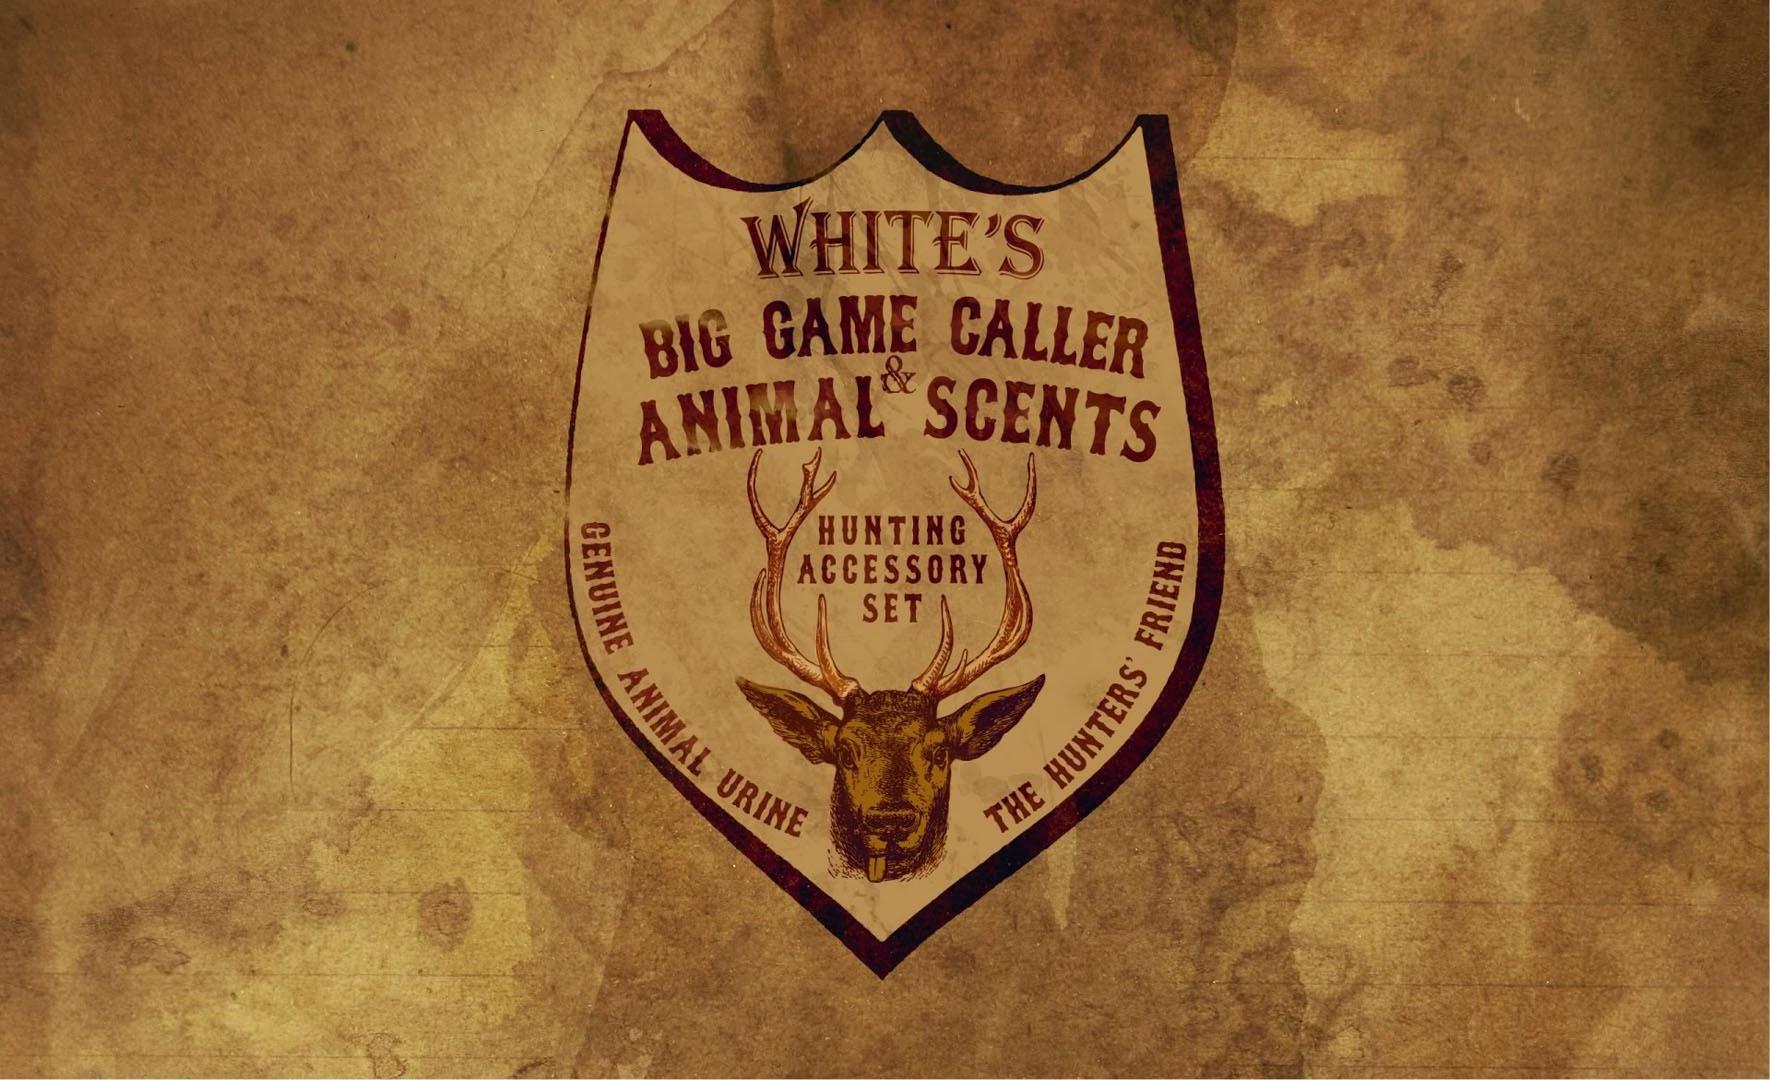 Big Game Caller Genuine Animal Scents Advert